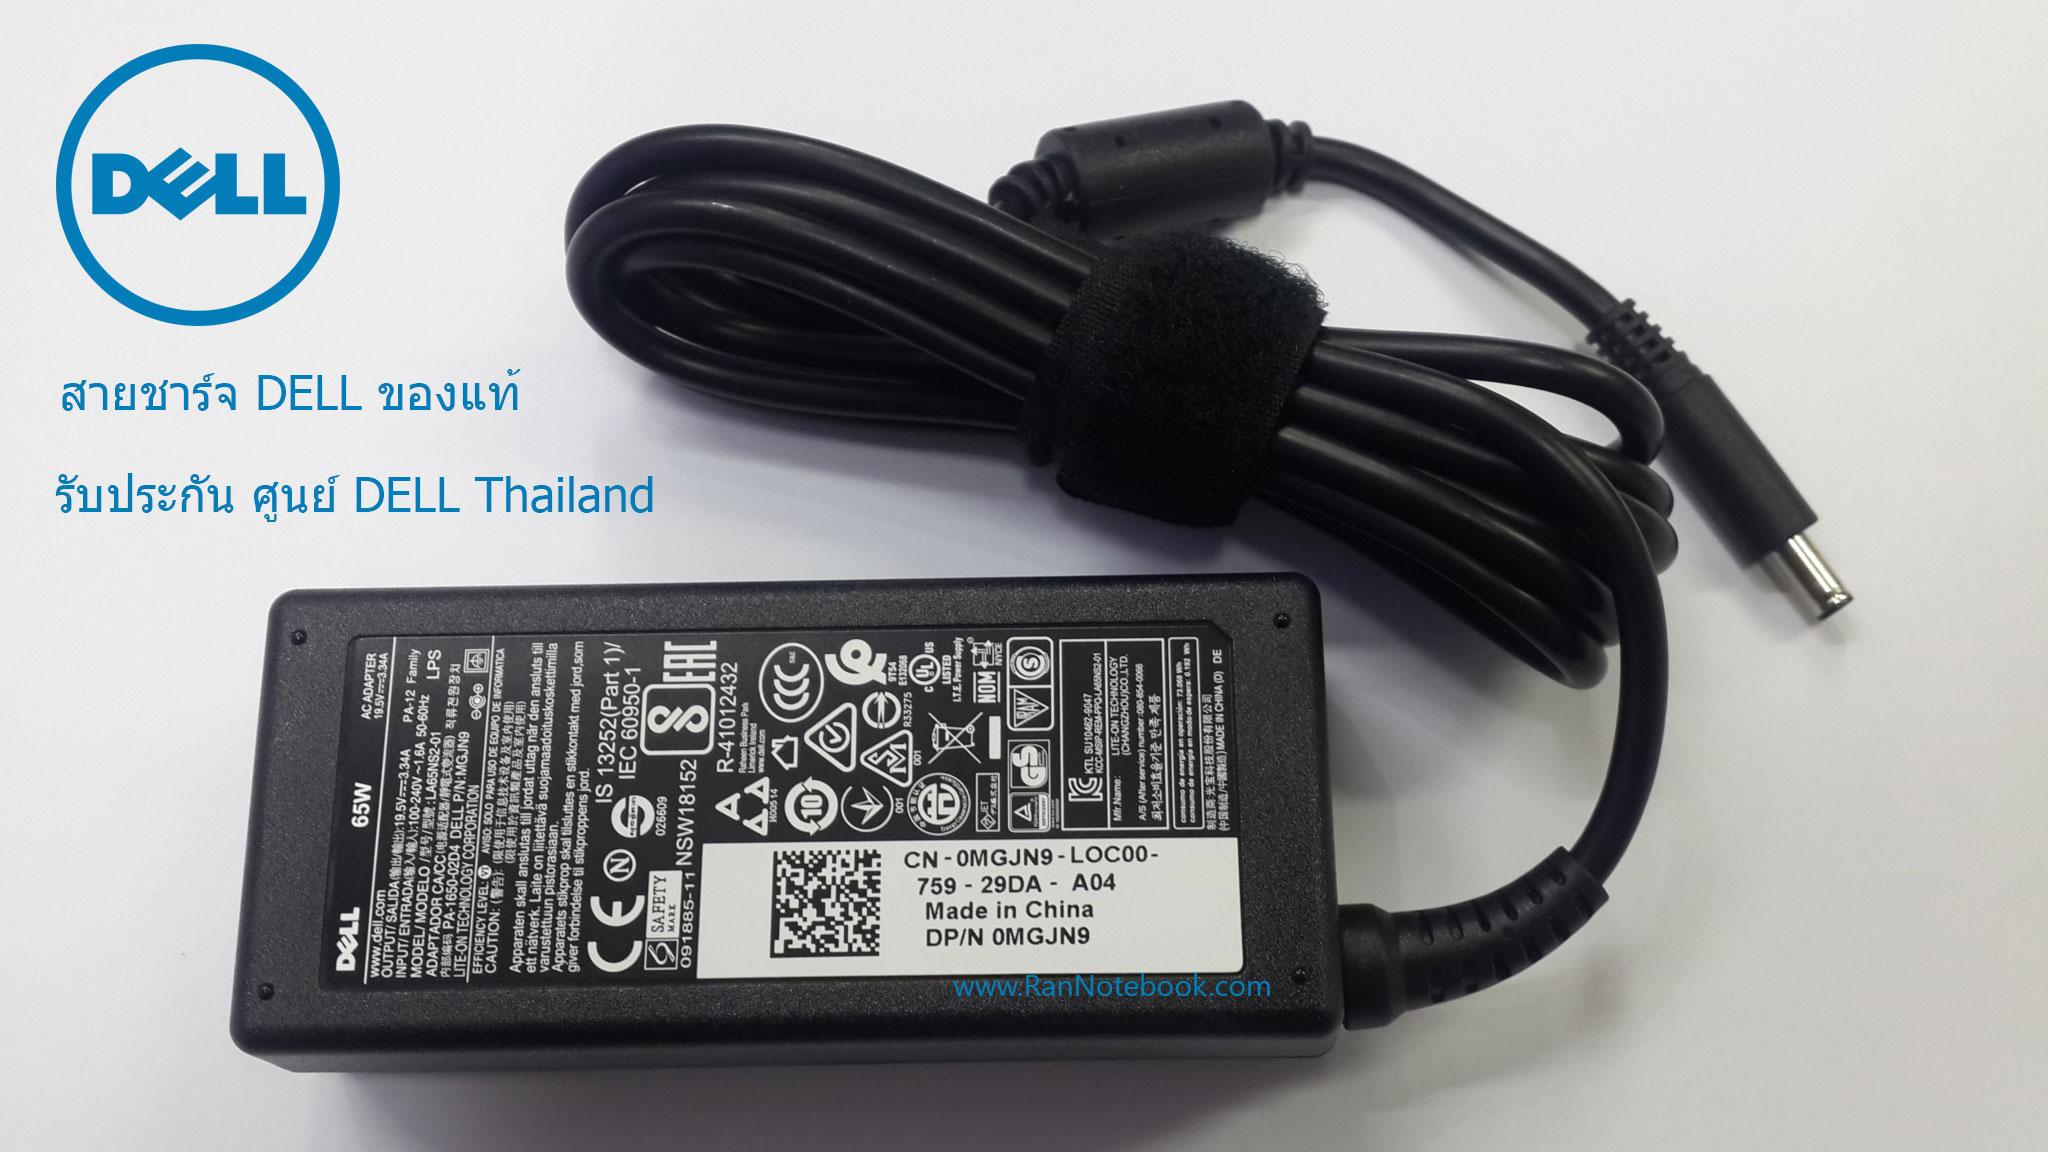 Adapter Dell Vostro 14 5468 MGJN9 ของแท้ ประกันศูนย์ Dell ราคา พิเศษ